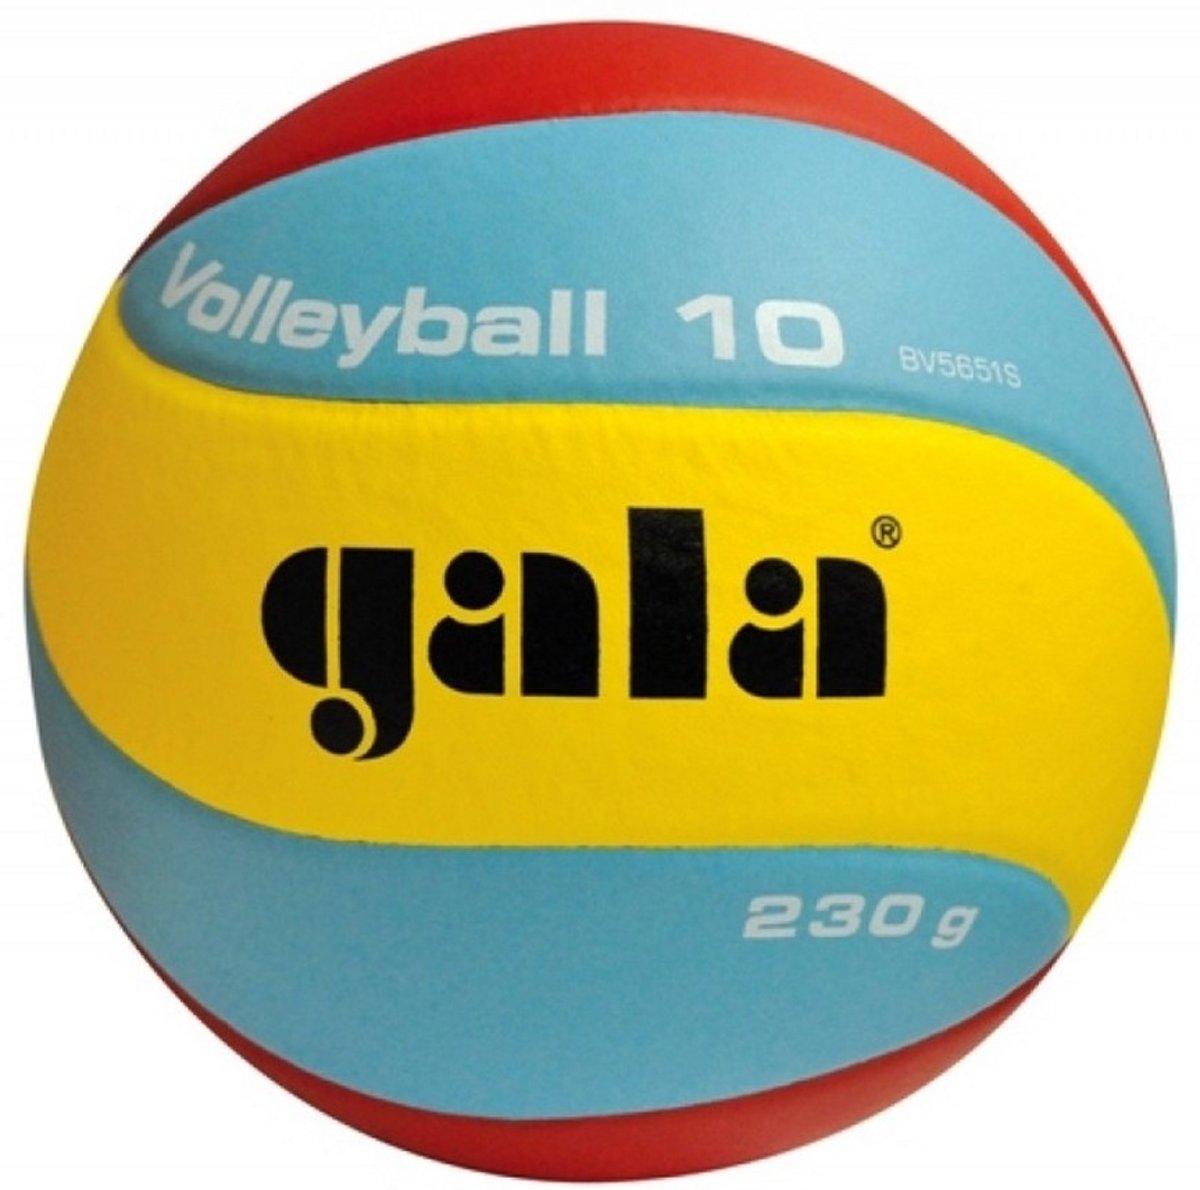 Gala volleybal Jeugd-/Minibal 230 gr kopen